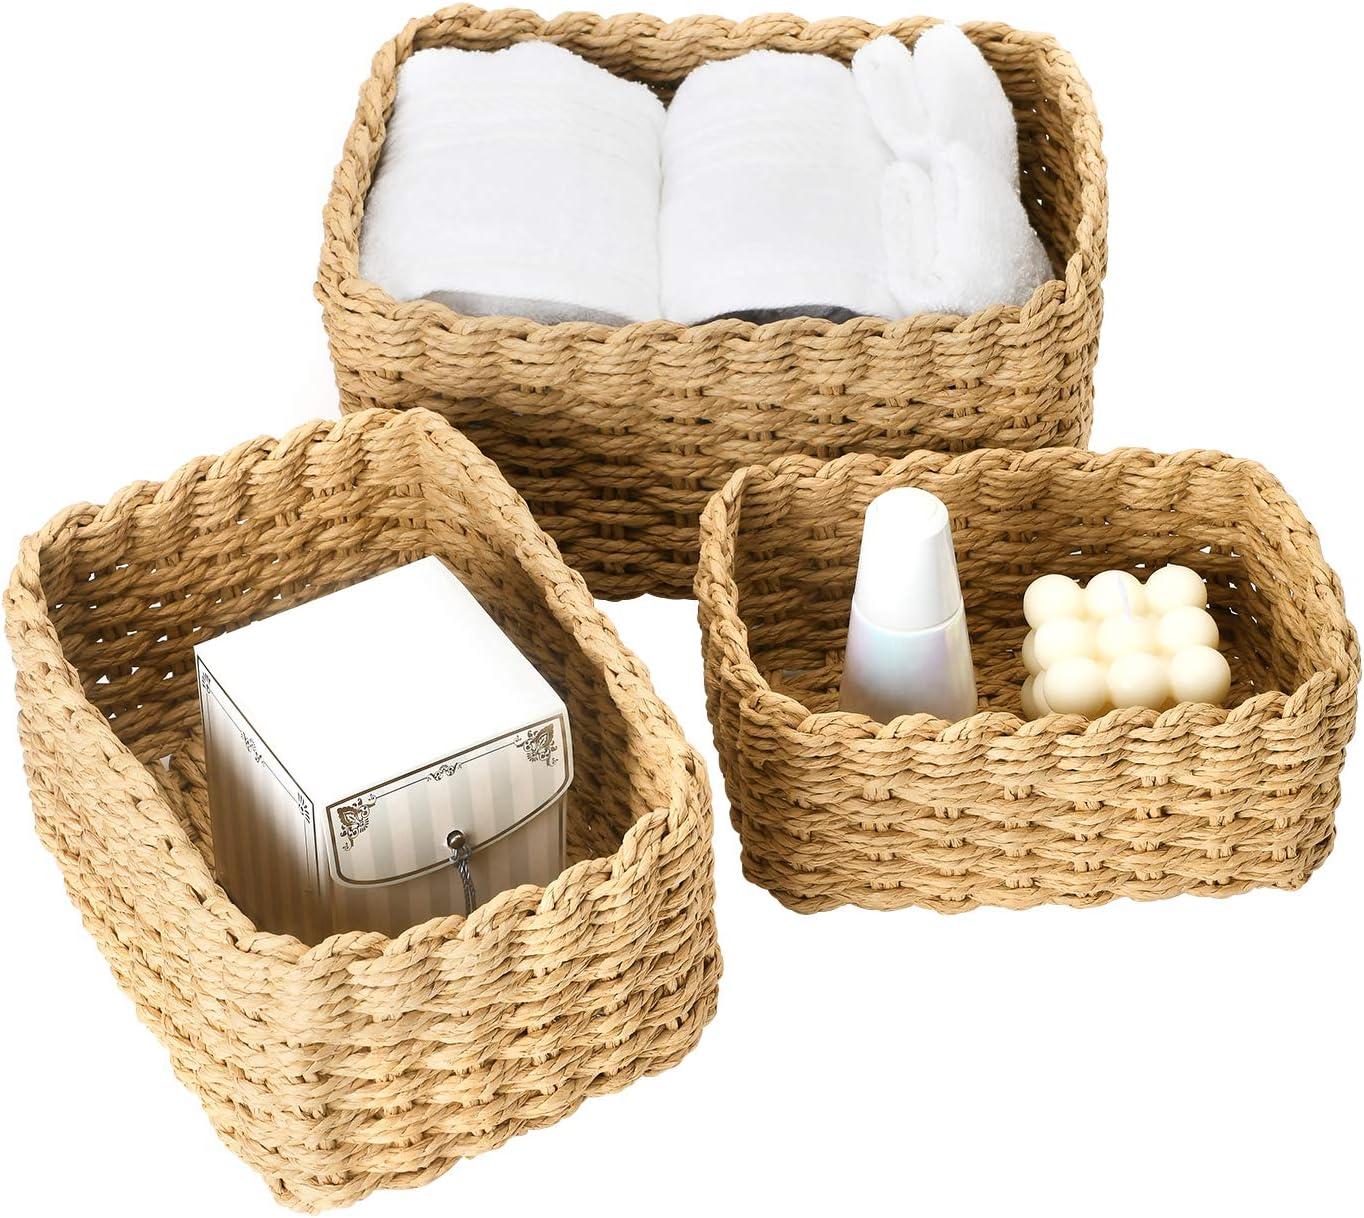 La Jolíe Muse Woven Storage Baskets, Recycled Paper Rope Bin Organizer Divider for Cupboards Drawer Closet Shelf Dresser, Set of 3 (Desert)